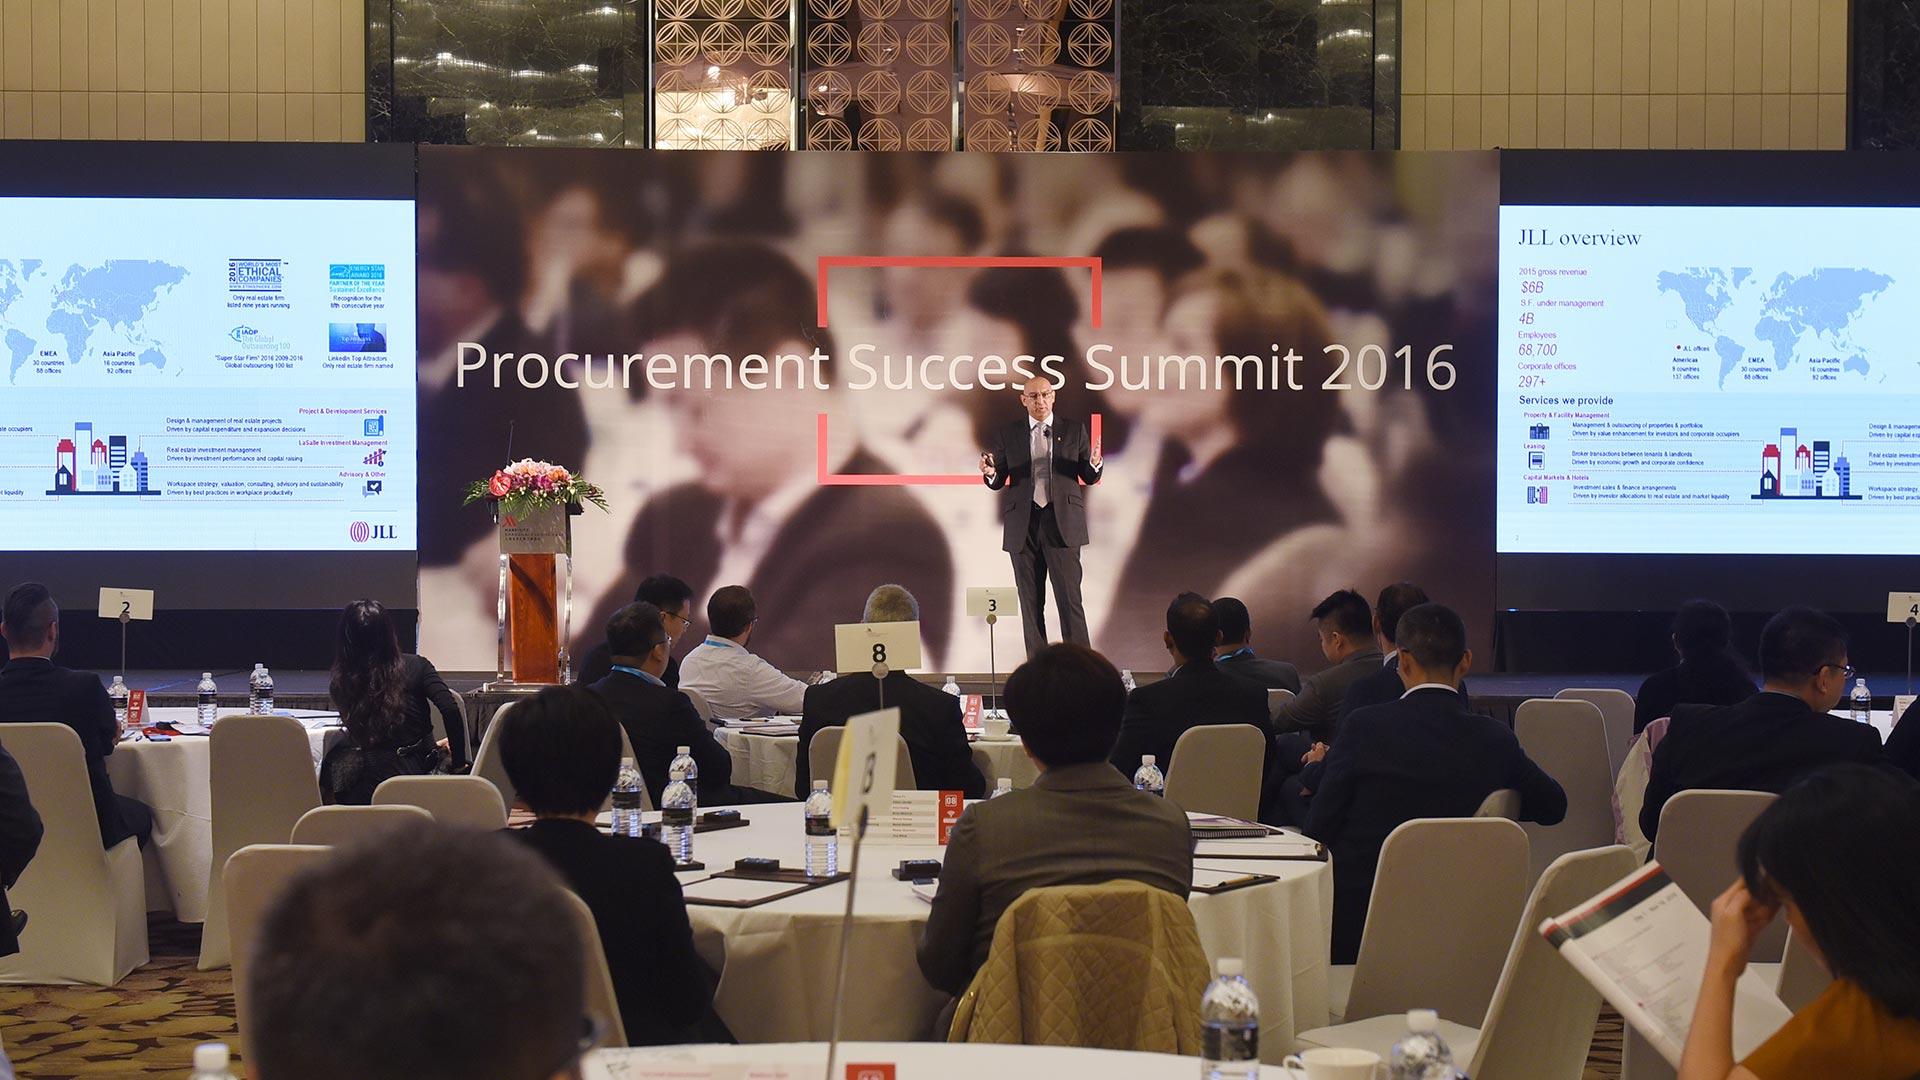 全球采购高层峰会 PROCUREMENT SUCCESS SUMMIT 2017